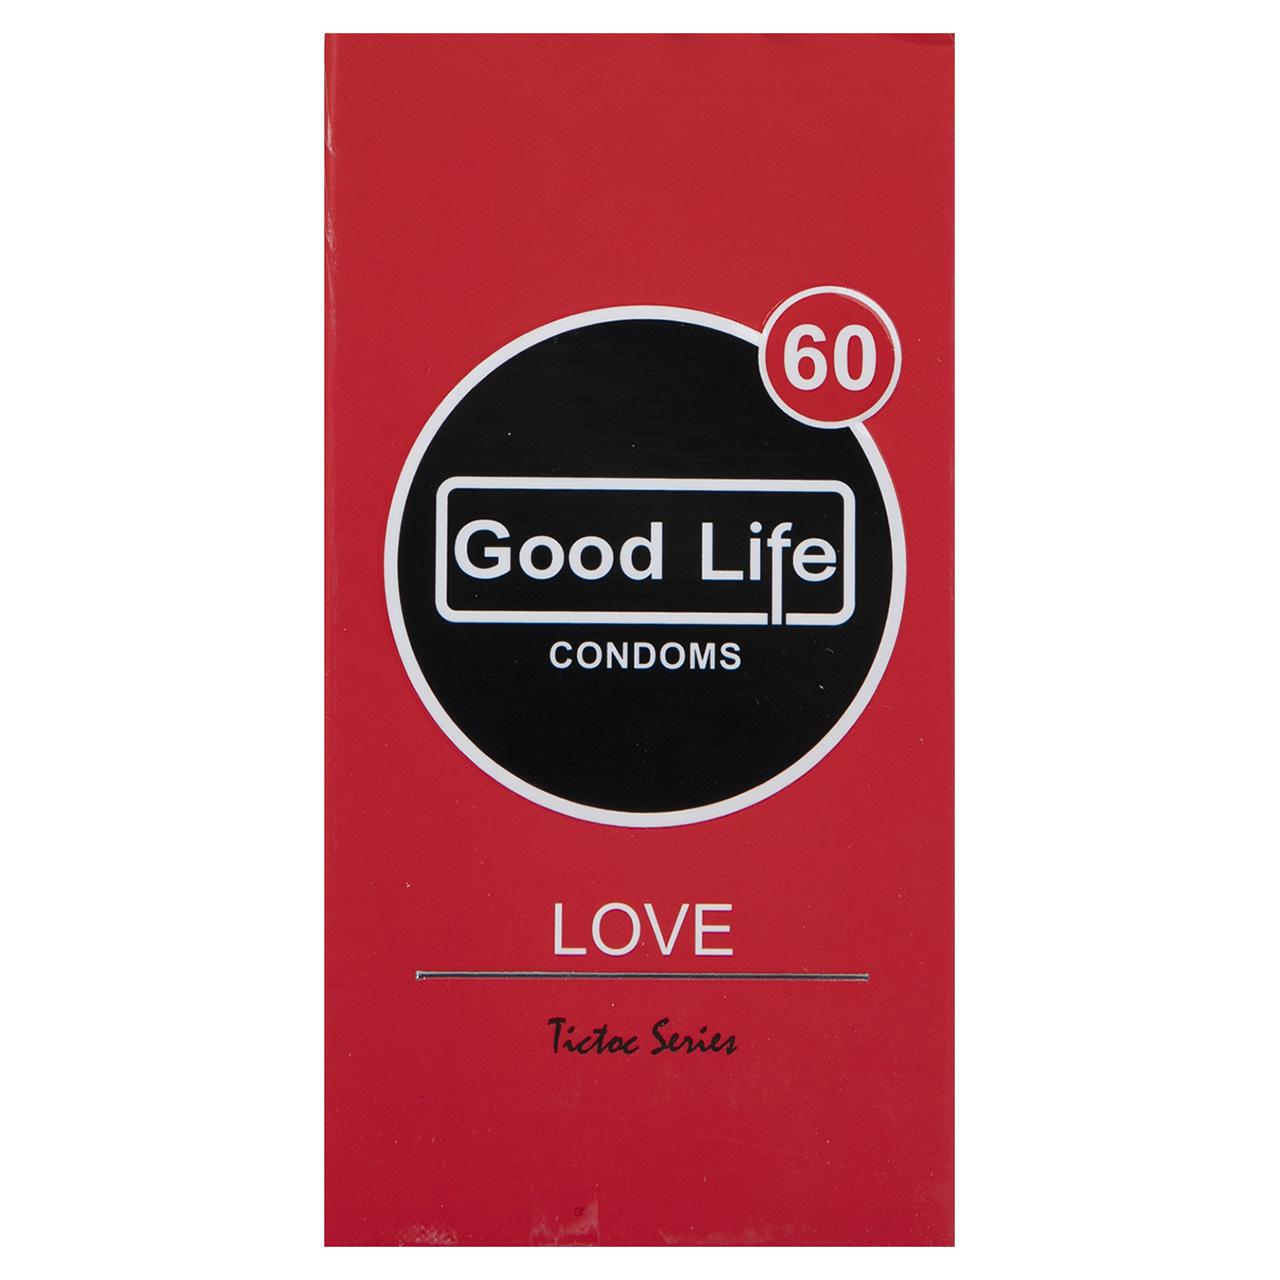 عکس کاندوم گودلایف مدل Love بسته 12 عددی